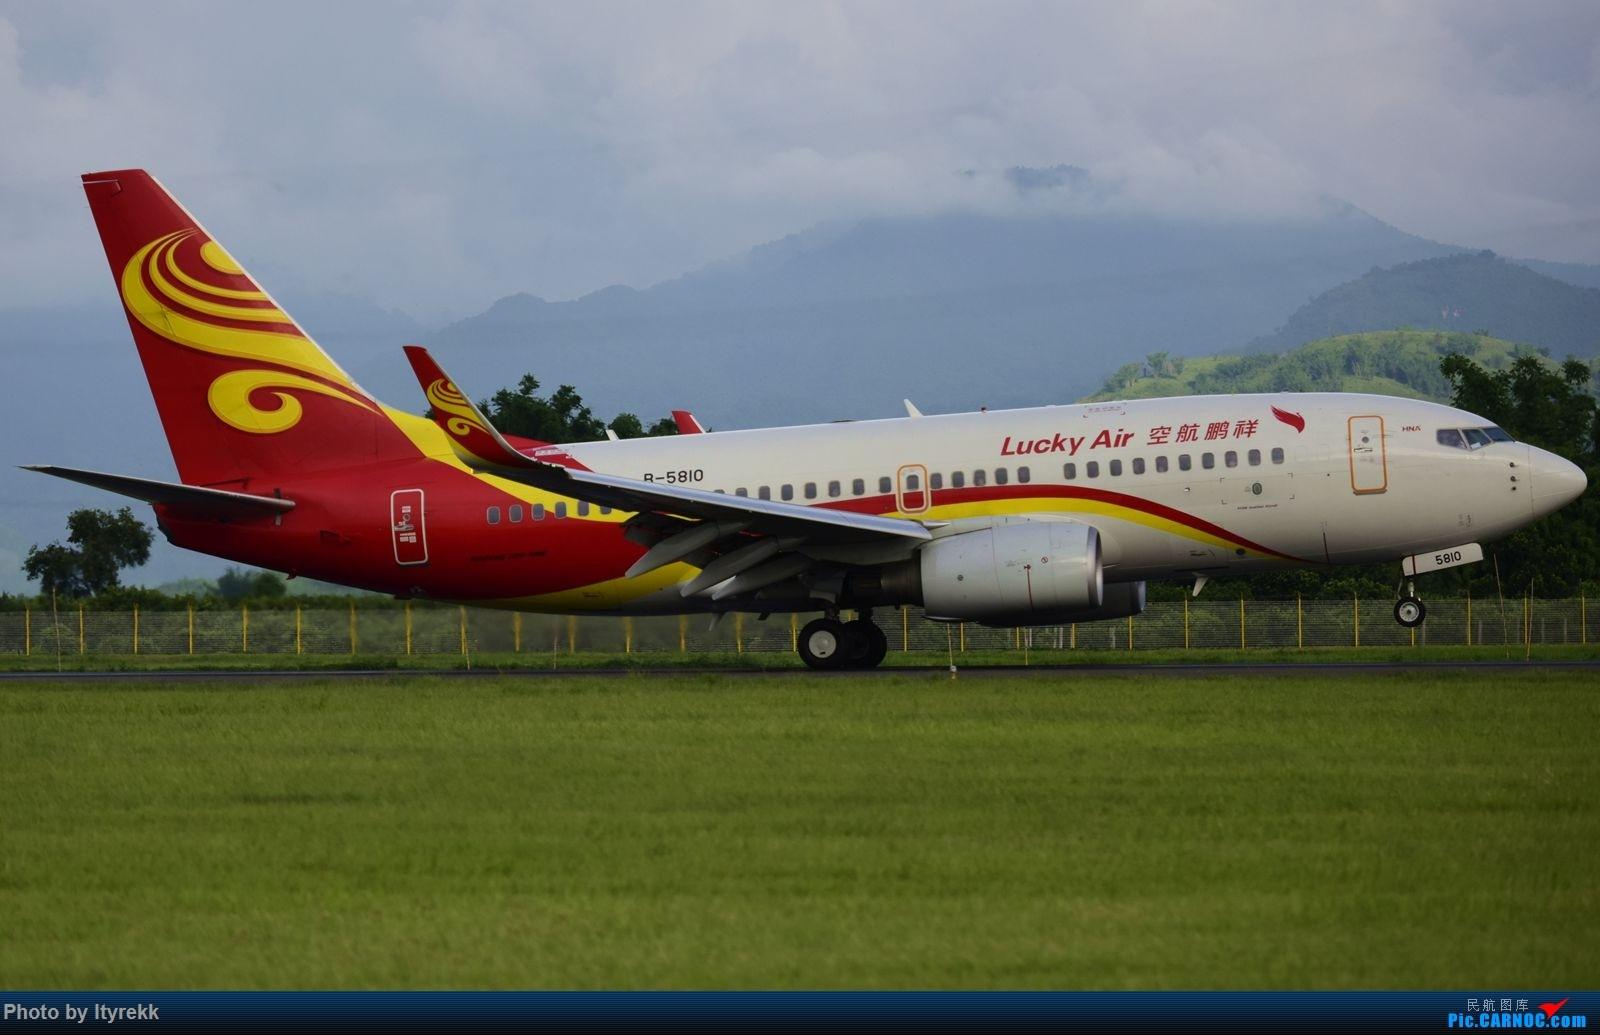 Re:[原创]怀念暑假时飞友们在一起拍机的日子 BOEING 737-700 B-5810 中国芒市机场